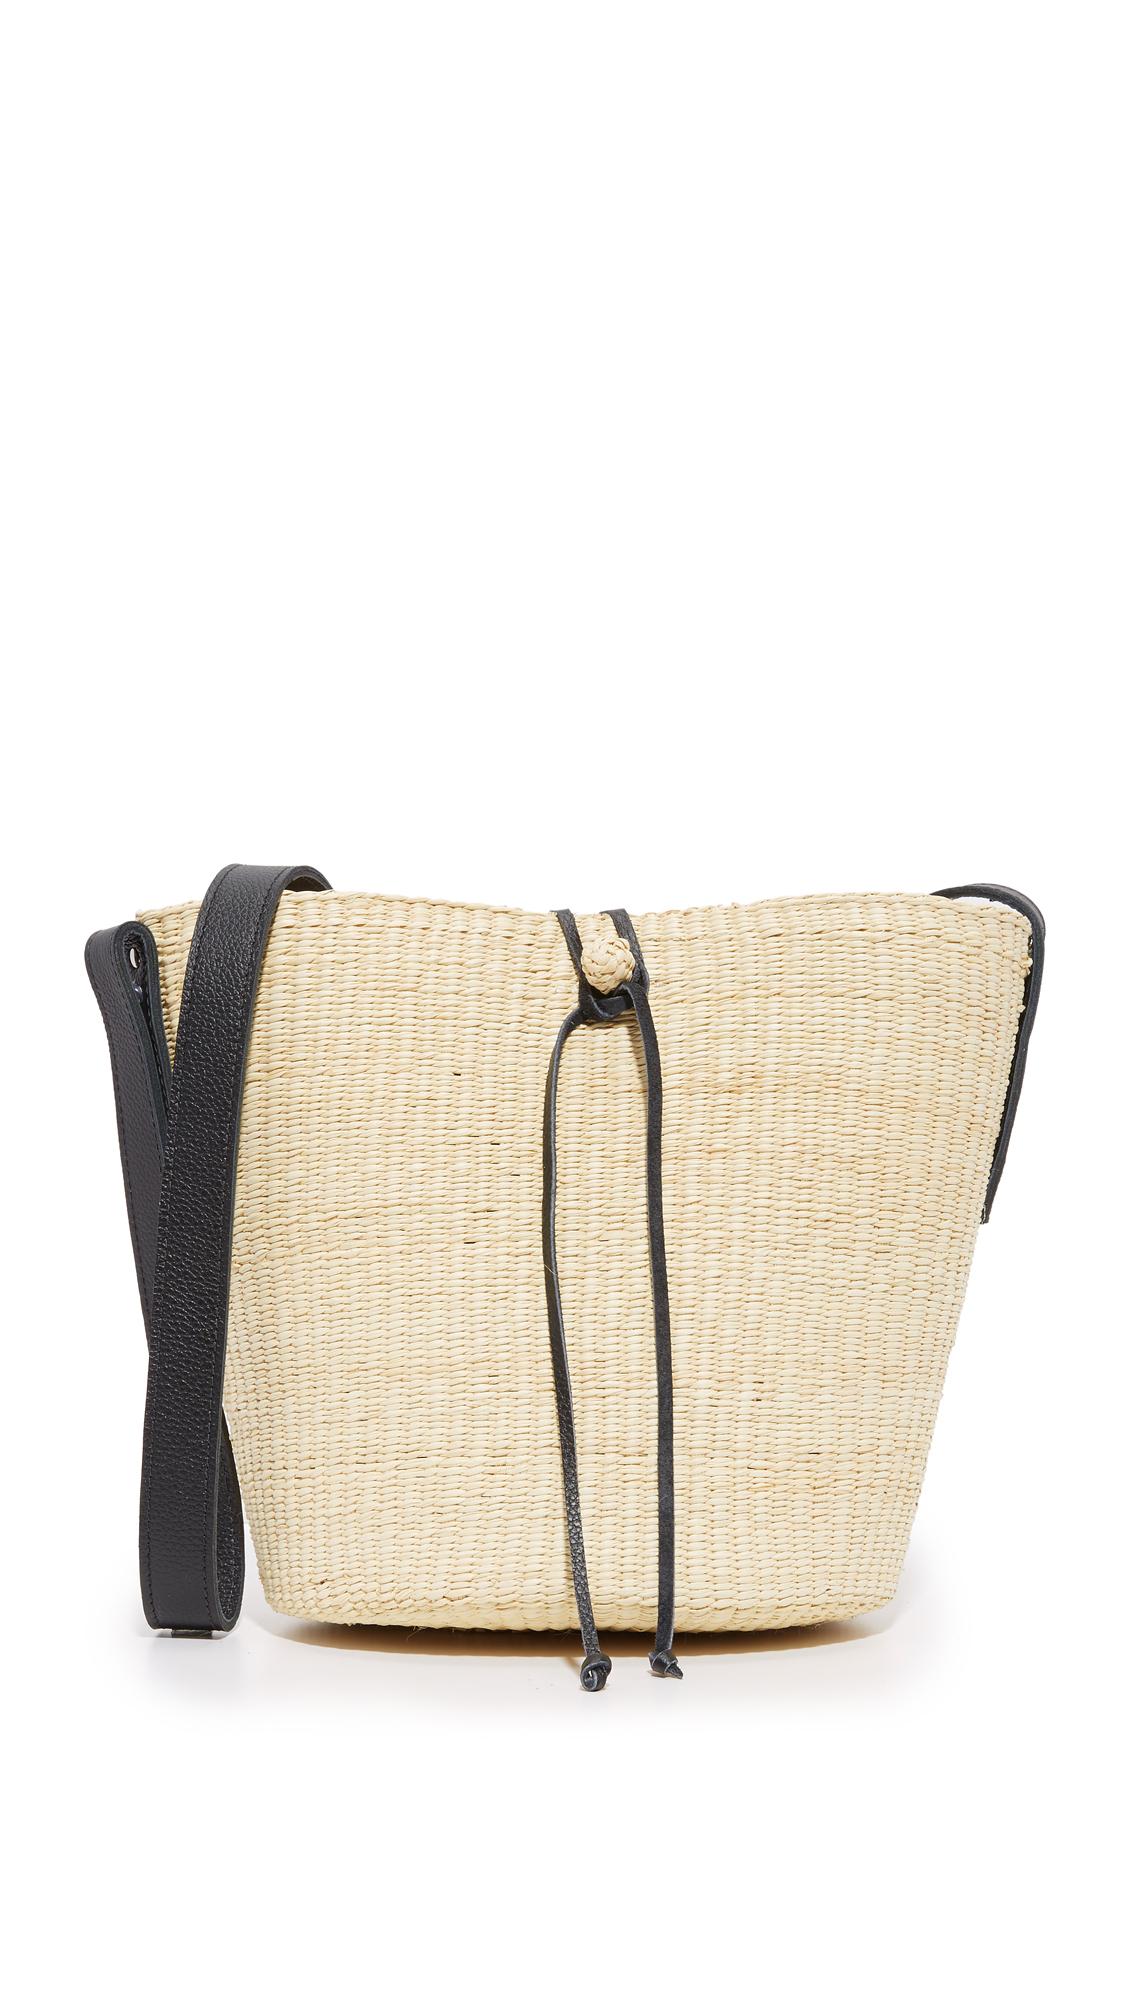 Sensi studio Cross Body Bucket Bag in Black | Lyst